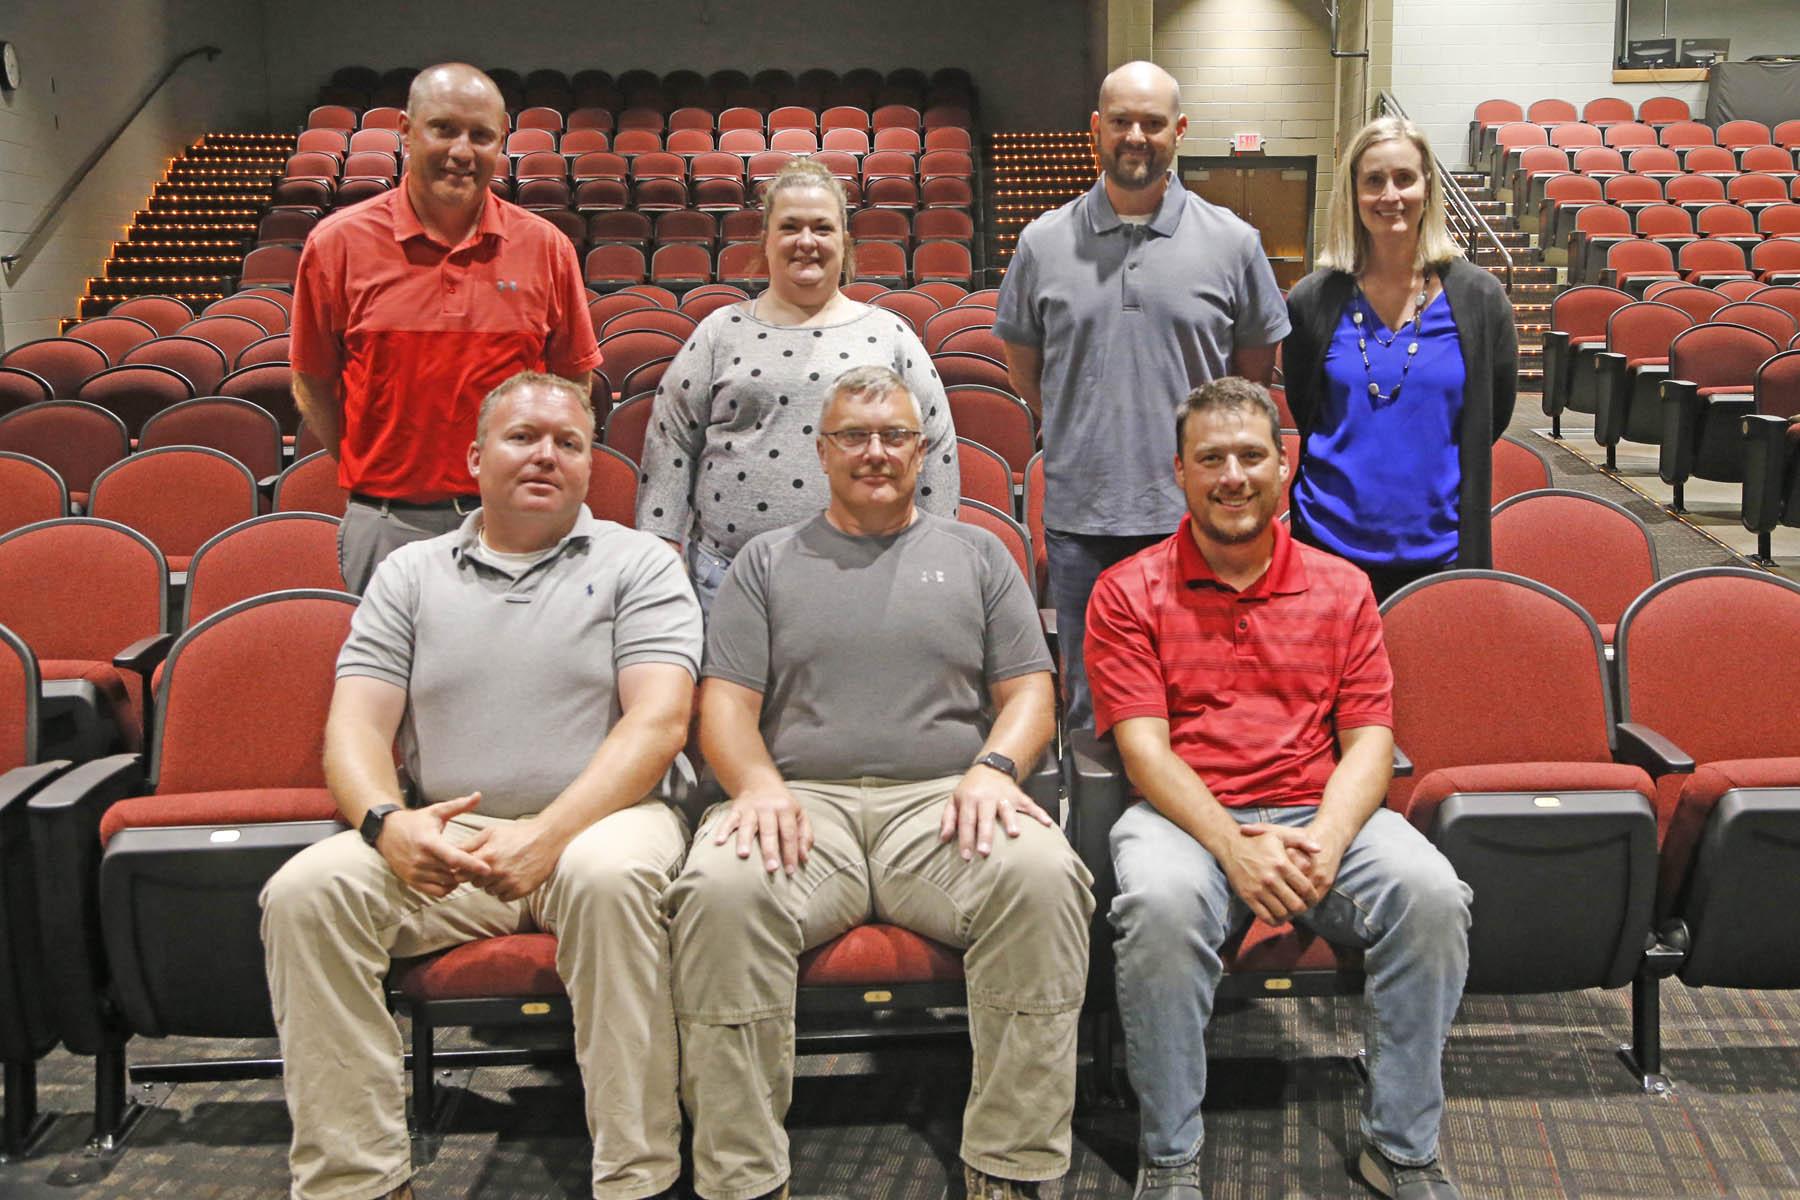 School board members Ben Schemmel, Kevin Sash, Brandon Paine, Corey Lorenzen, Jenna Scott, Darrell DeWinter, Kristi Martin